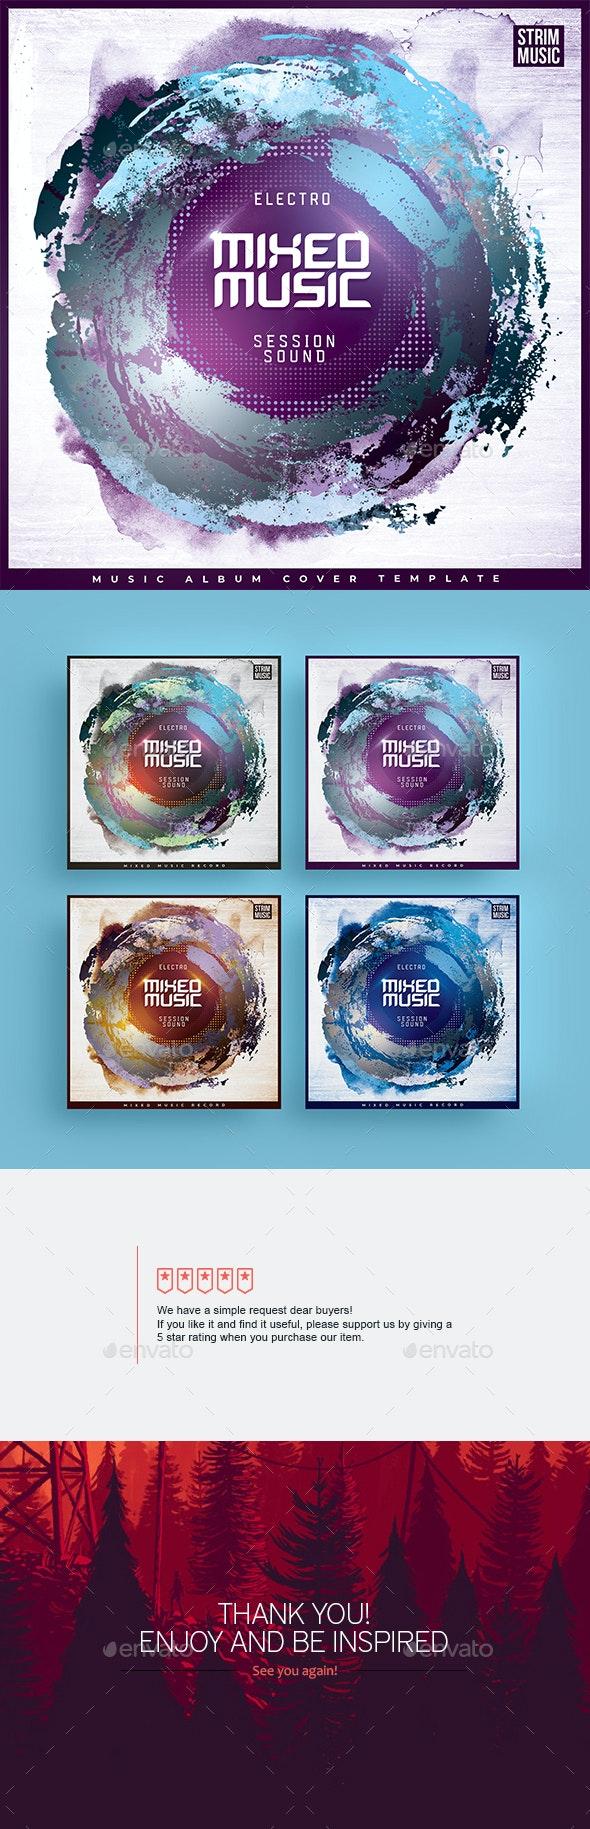 Mixed Music - Music Album Cover Artwork - Miscellaneous Social Media